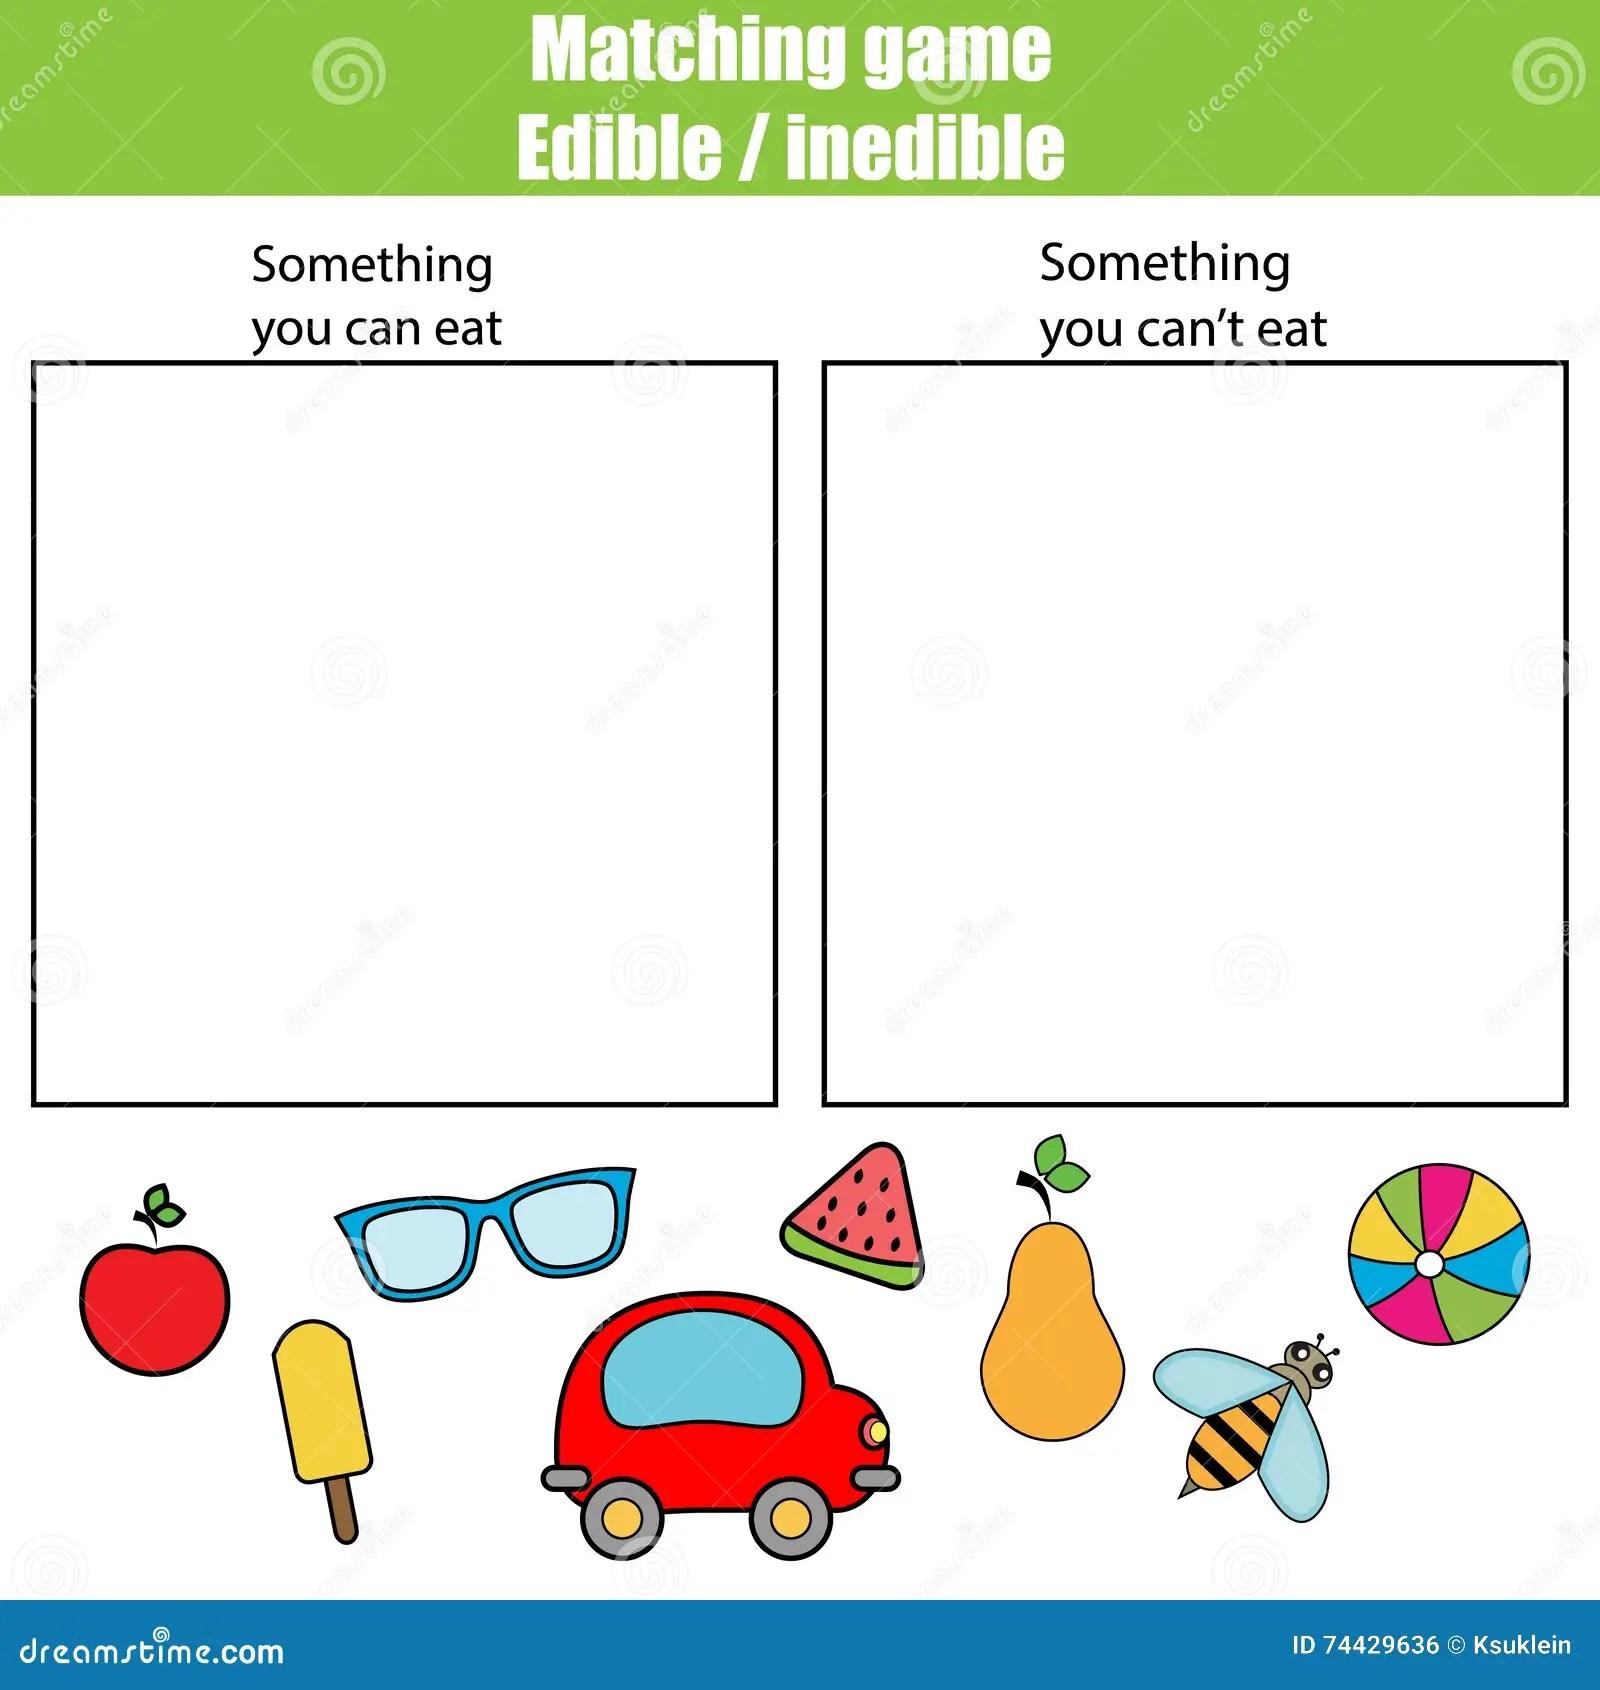 Edible Inedible Educational Children Game Kids Activity Sheet Stock Photo